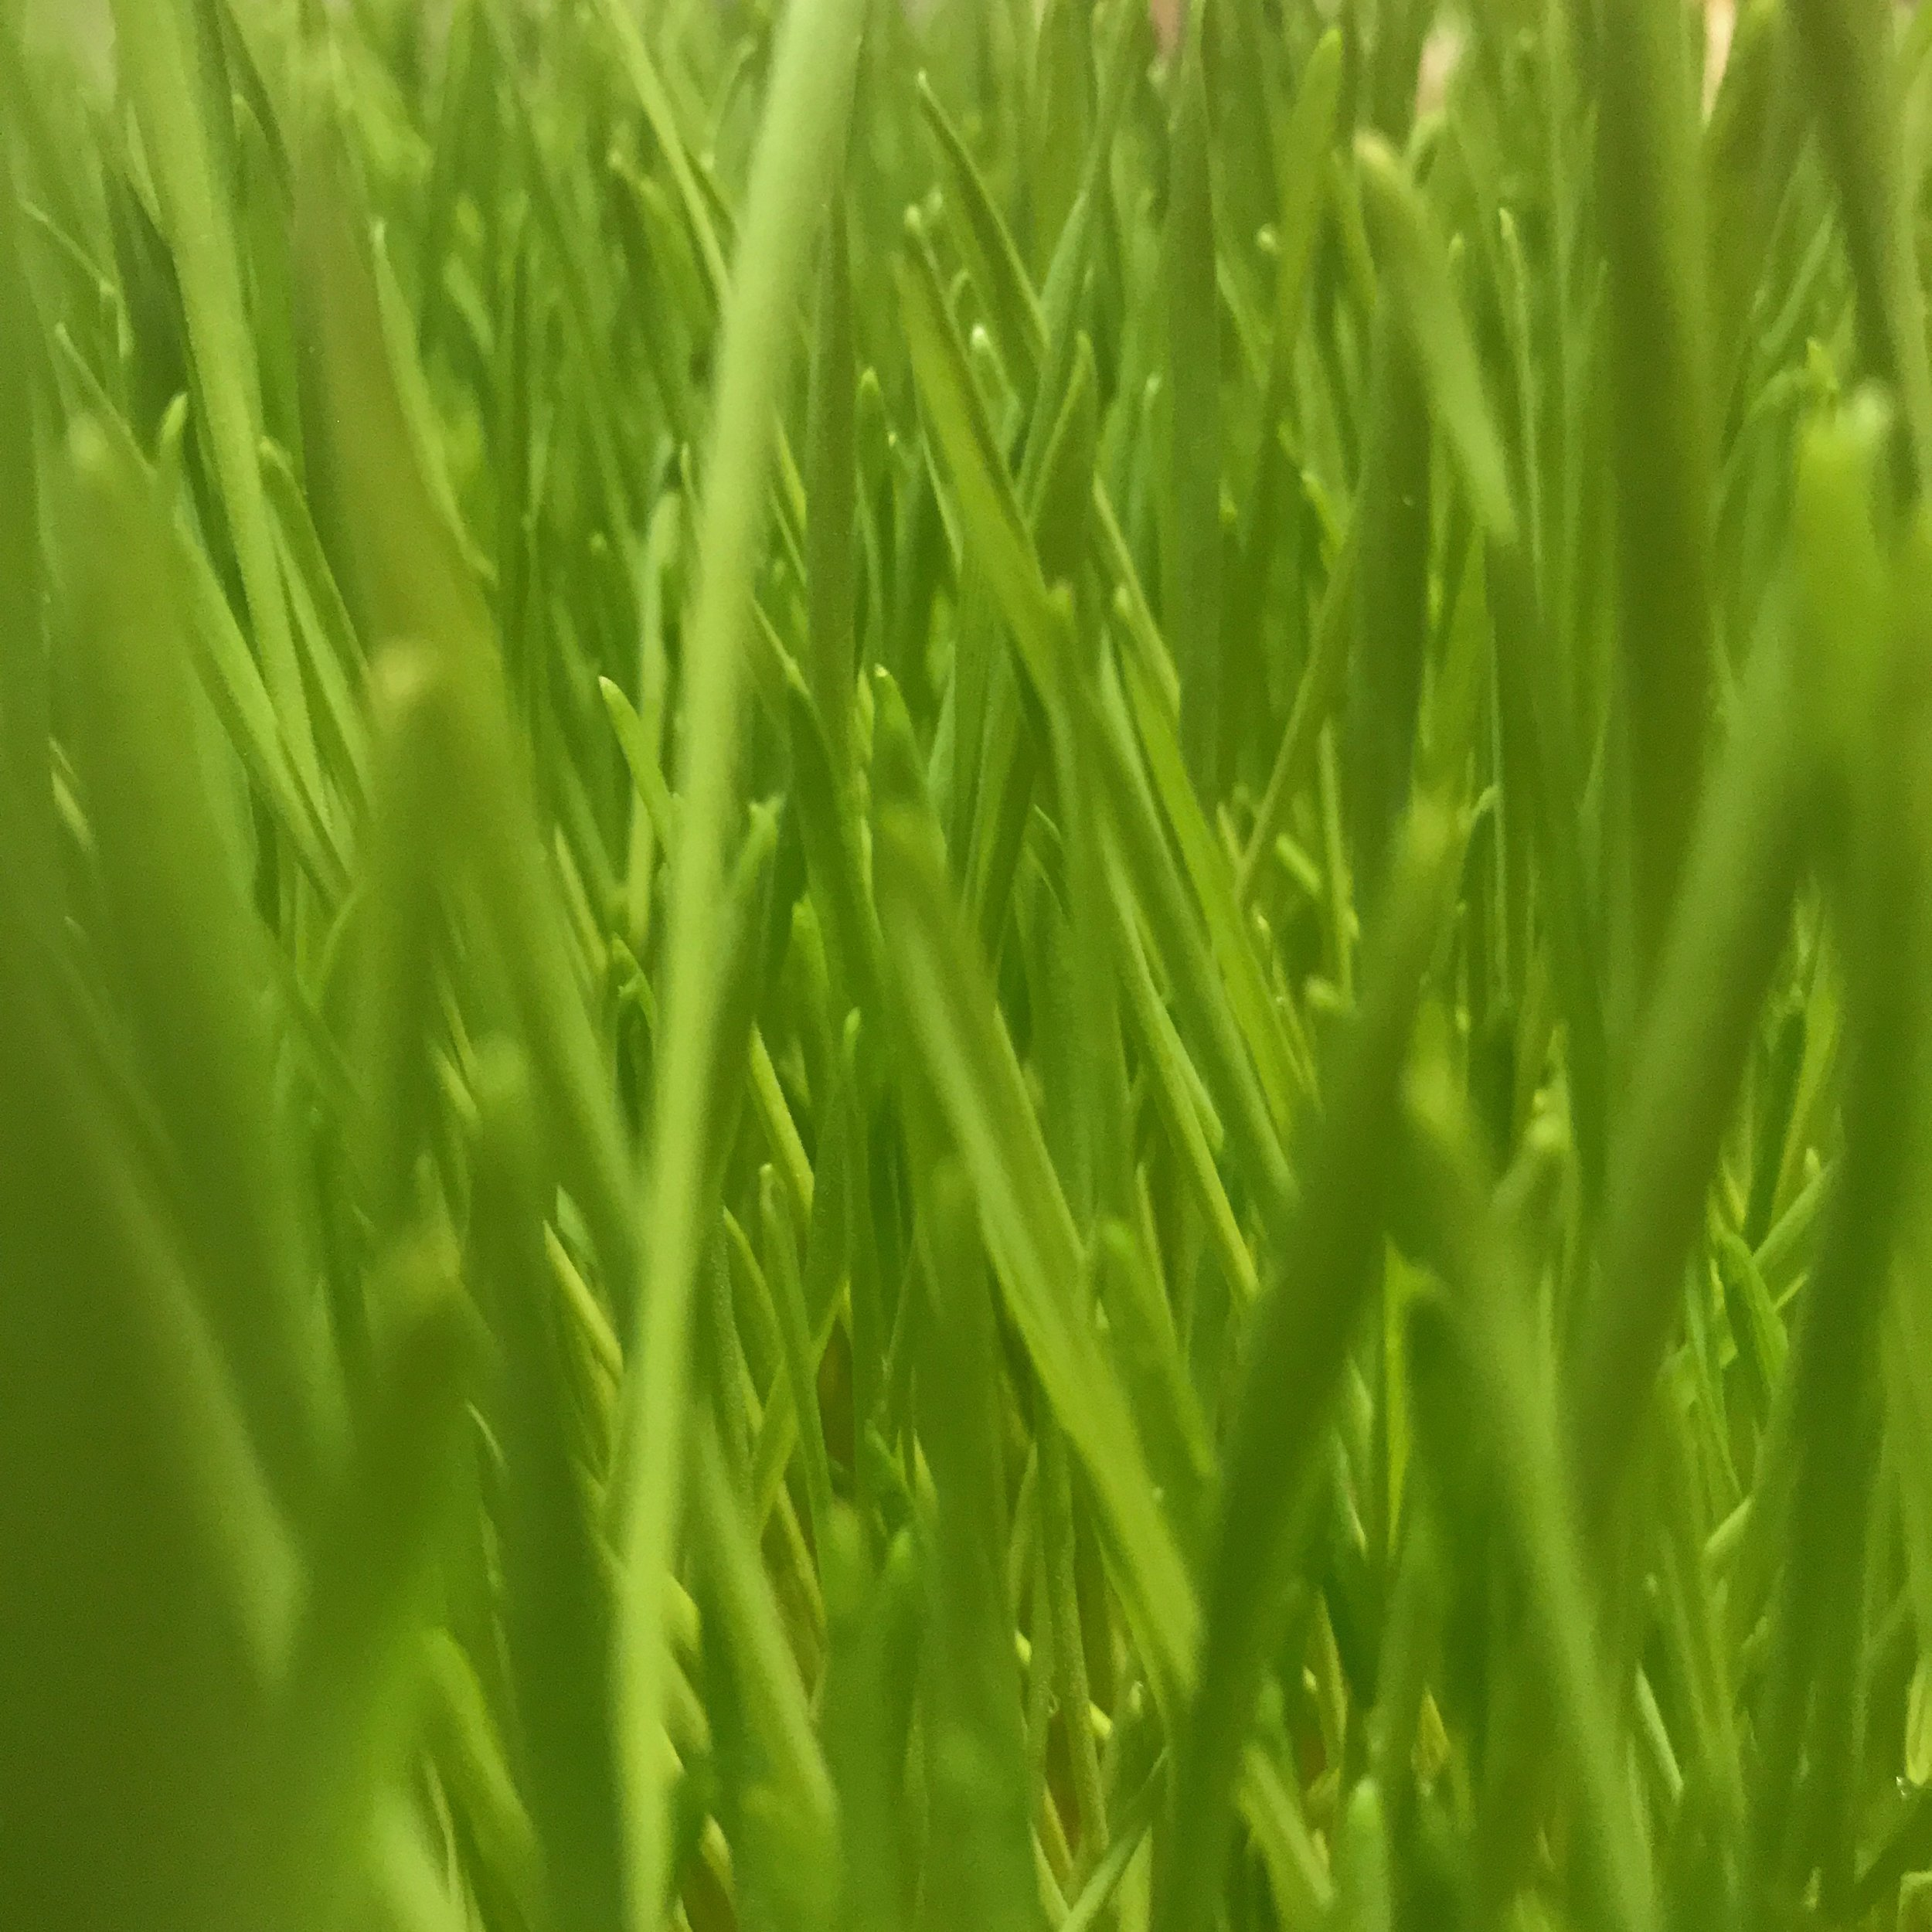 Wheatgrass close.jpg